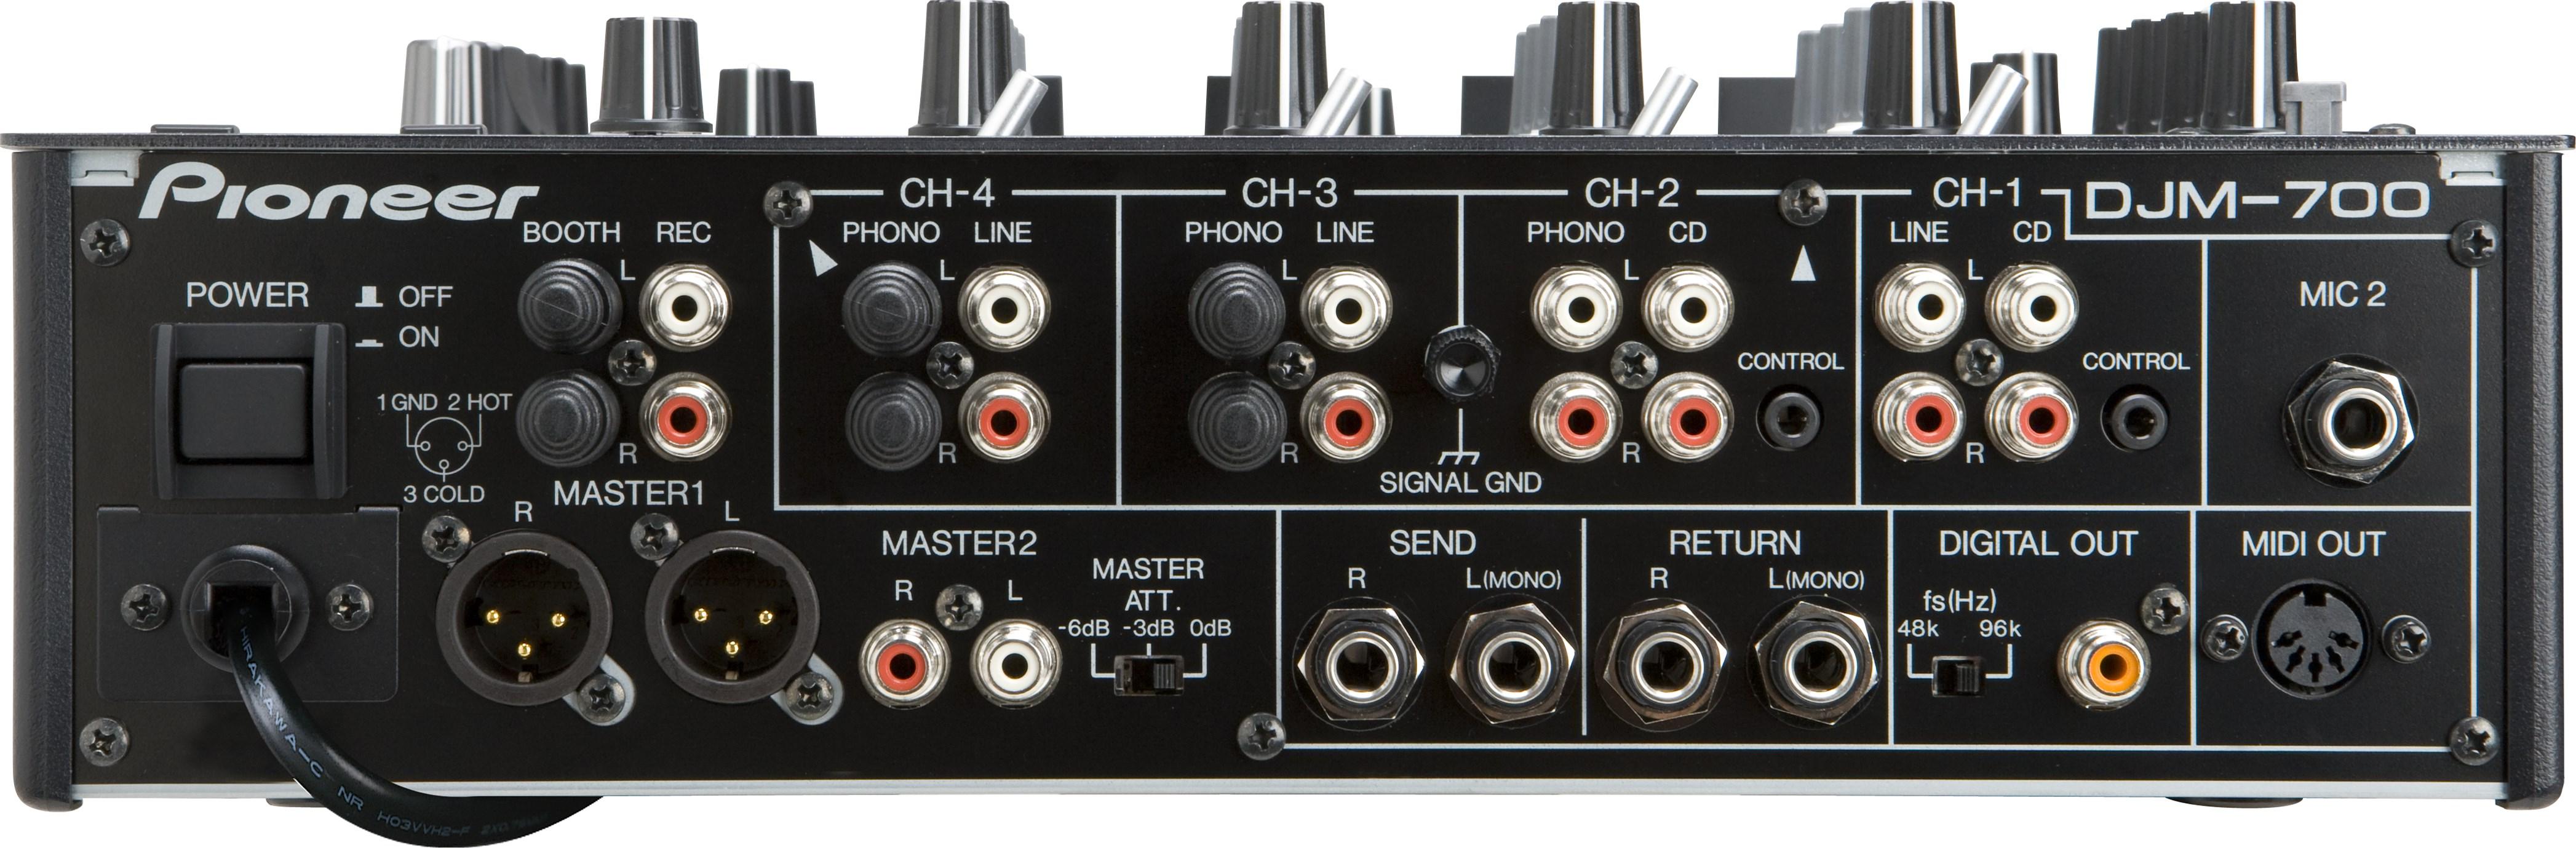 DJM-700 back